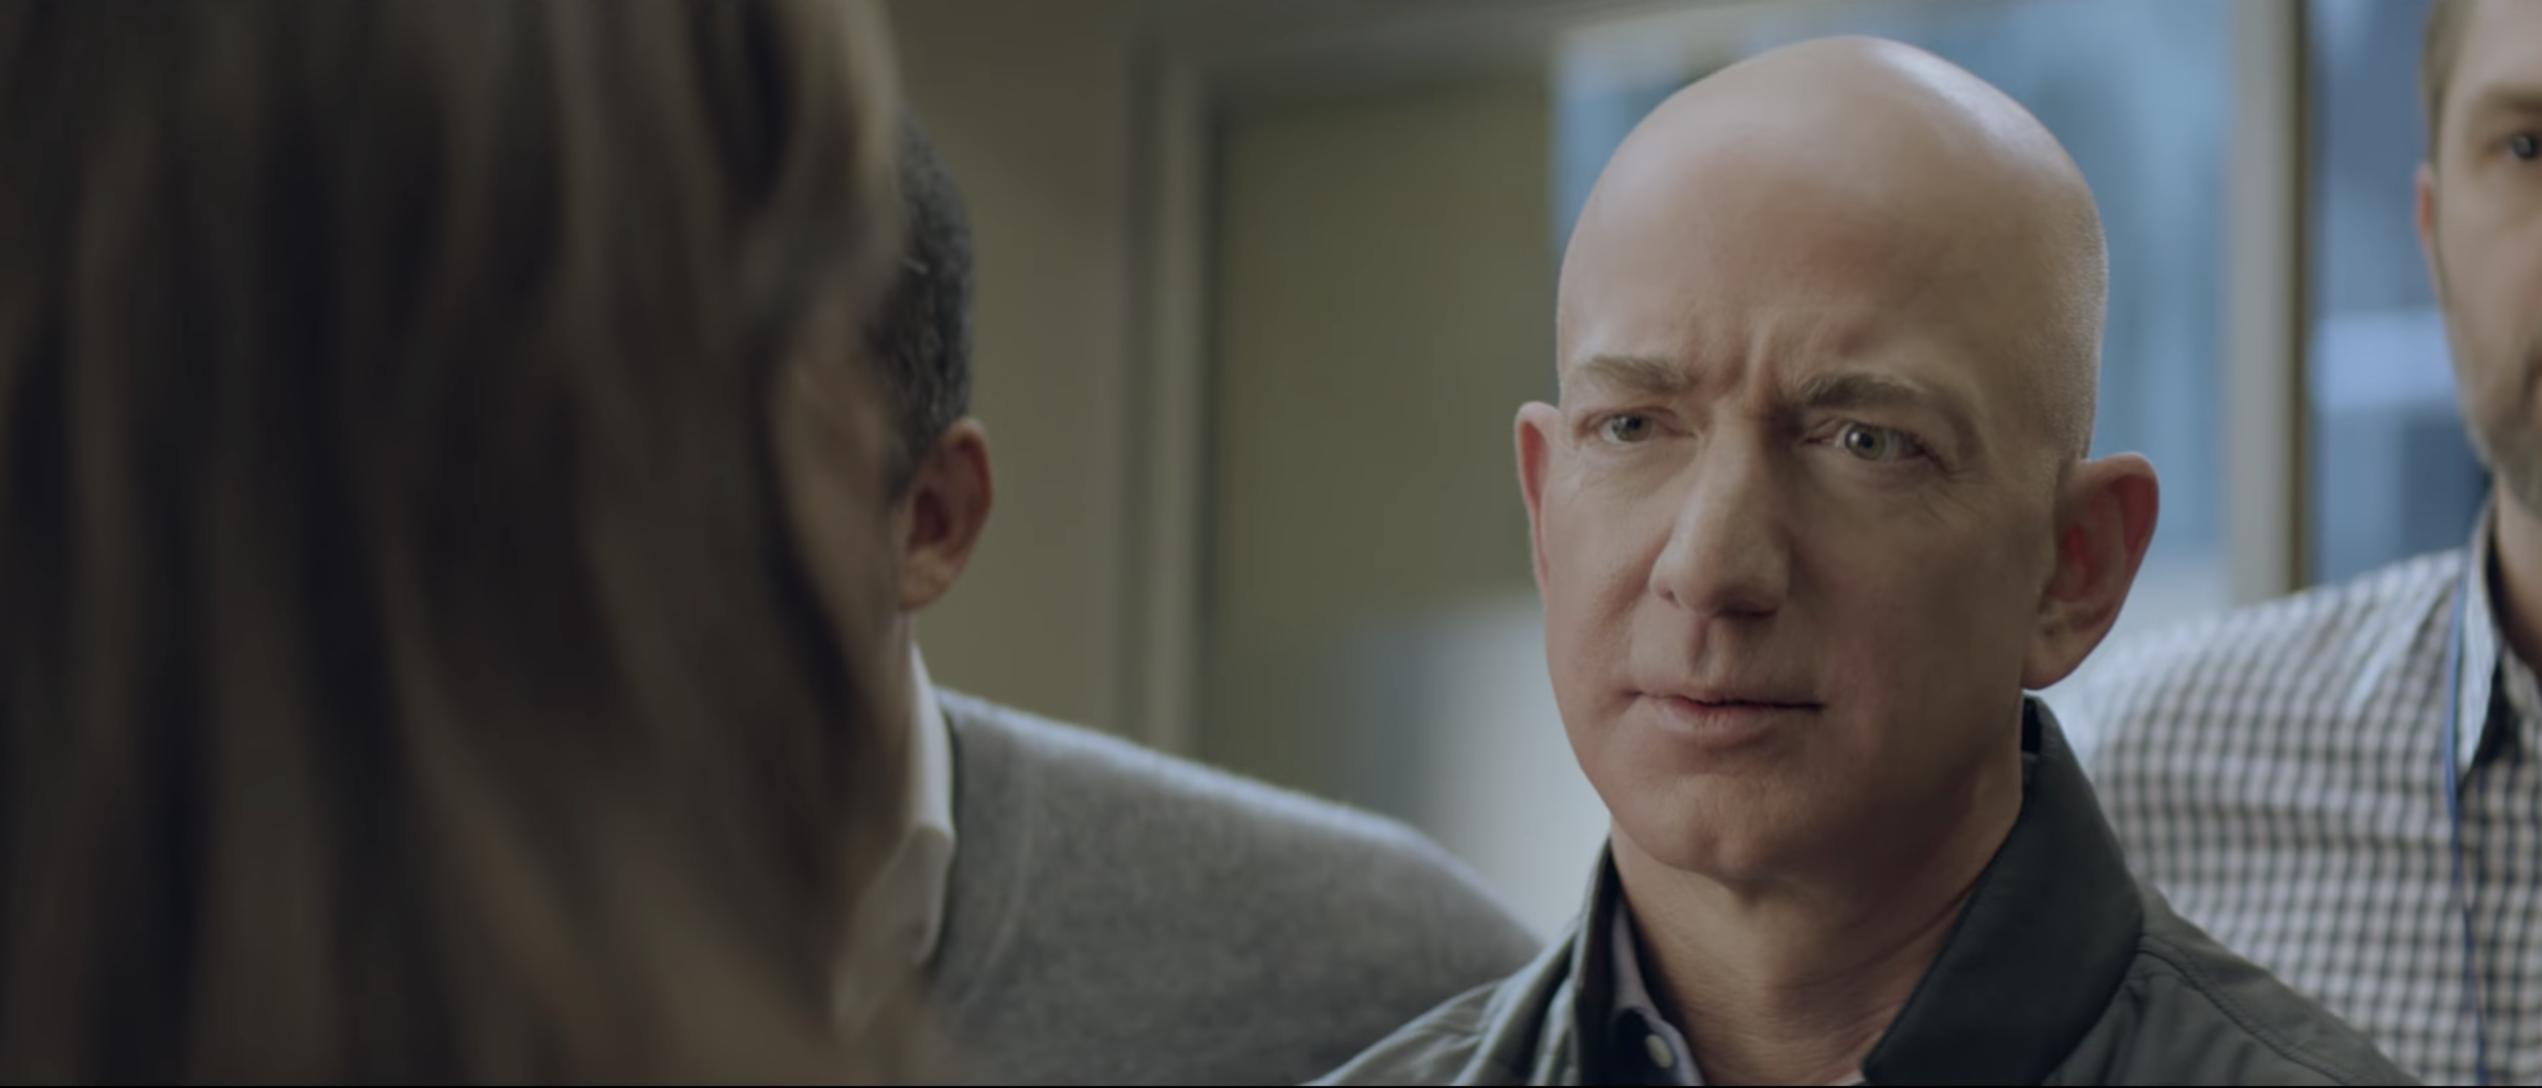 Jeff Bezos Amazon Alexa Super Bowl commercial